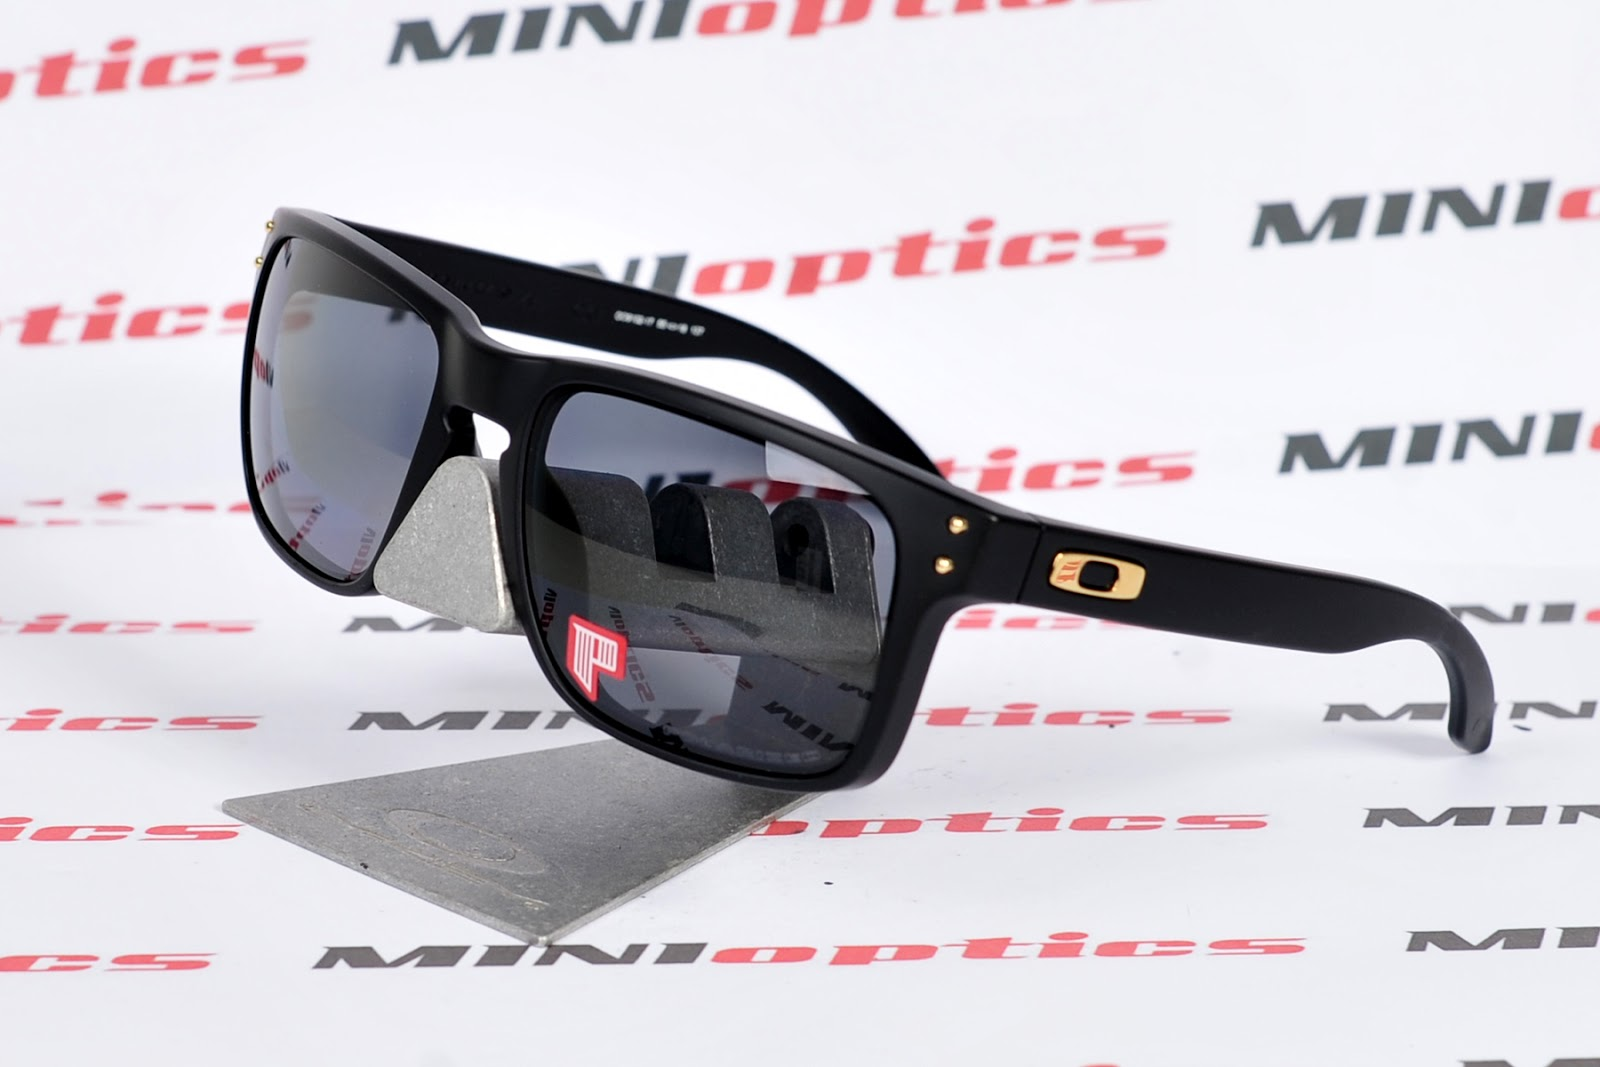 bb3820289c Oakley Shaun White Signature Holbrook Matte Black Sunglasses ...